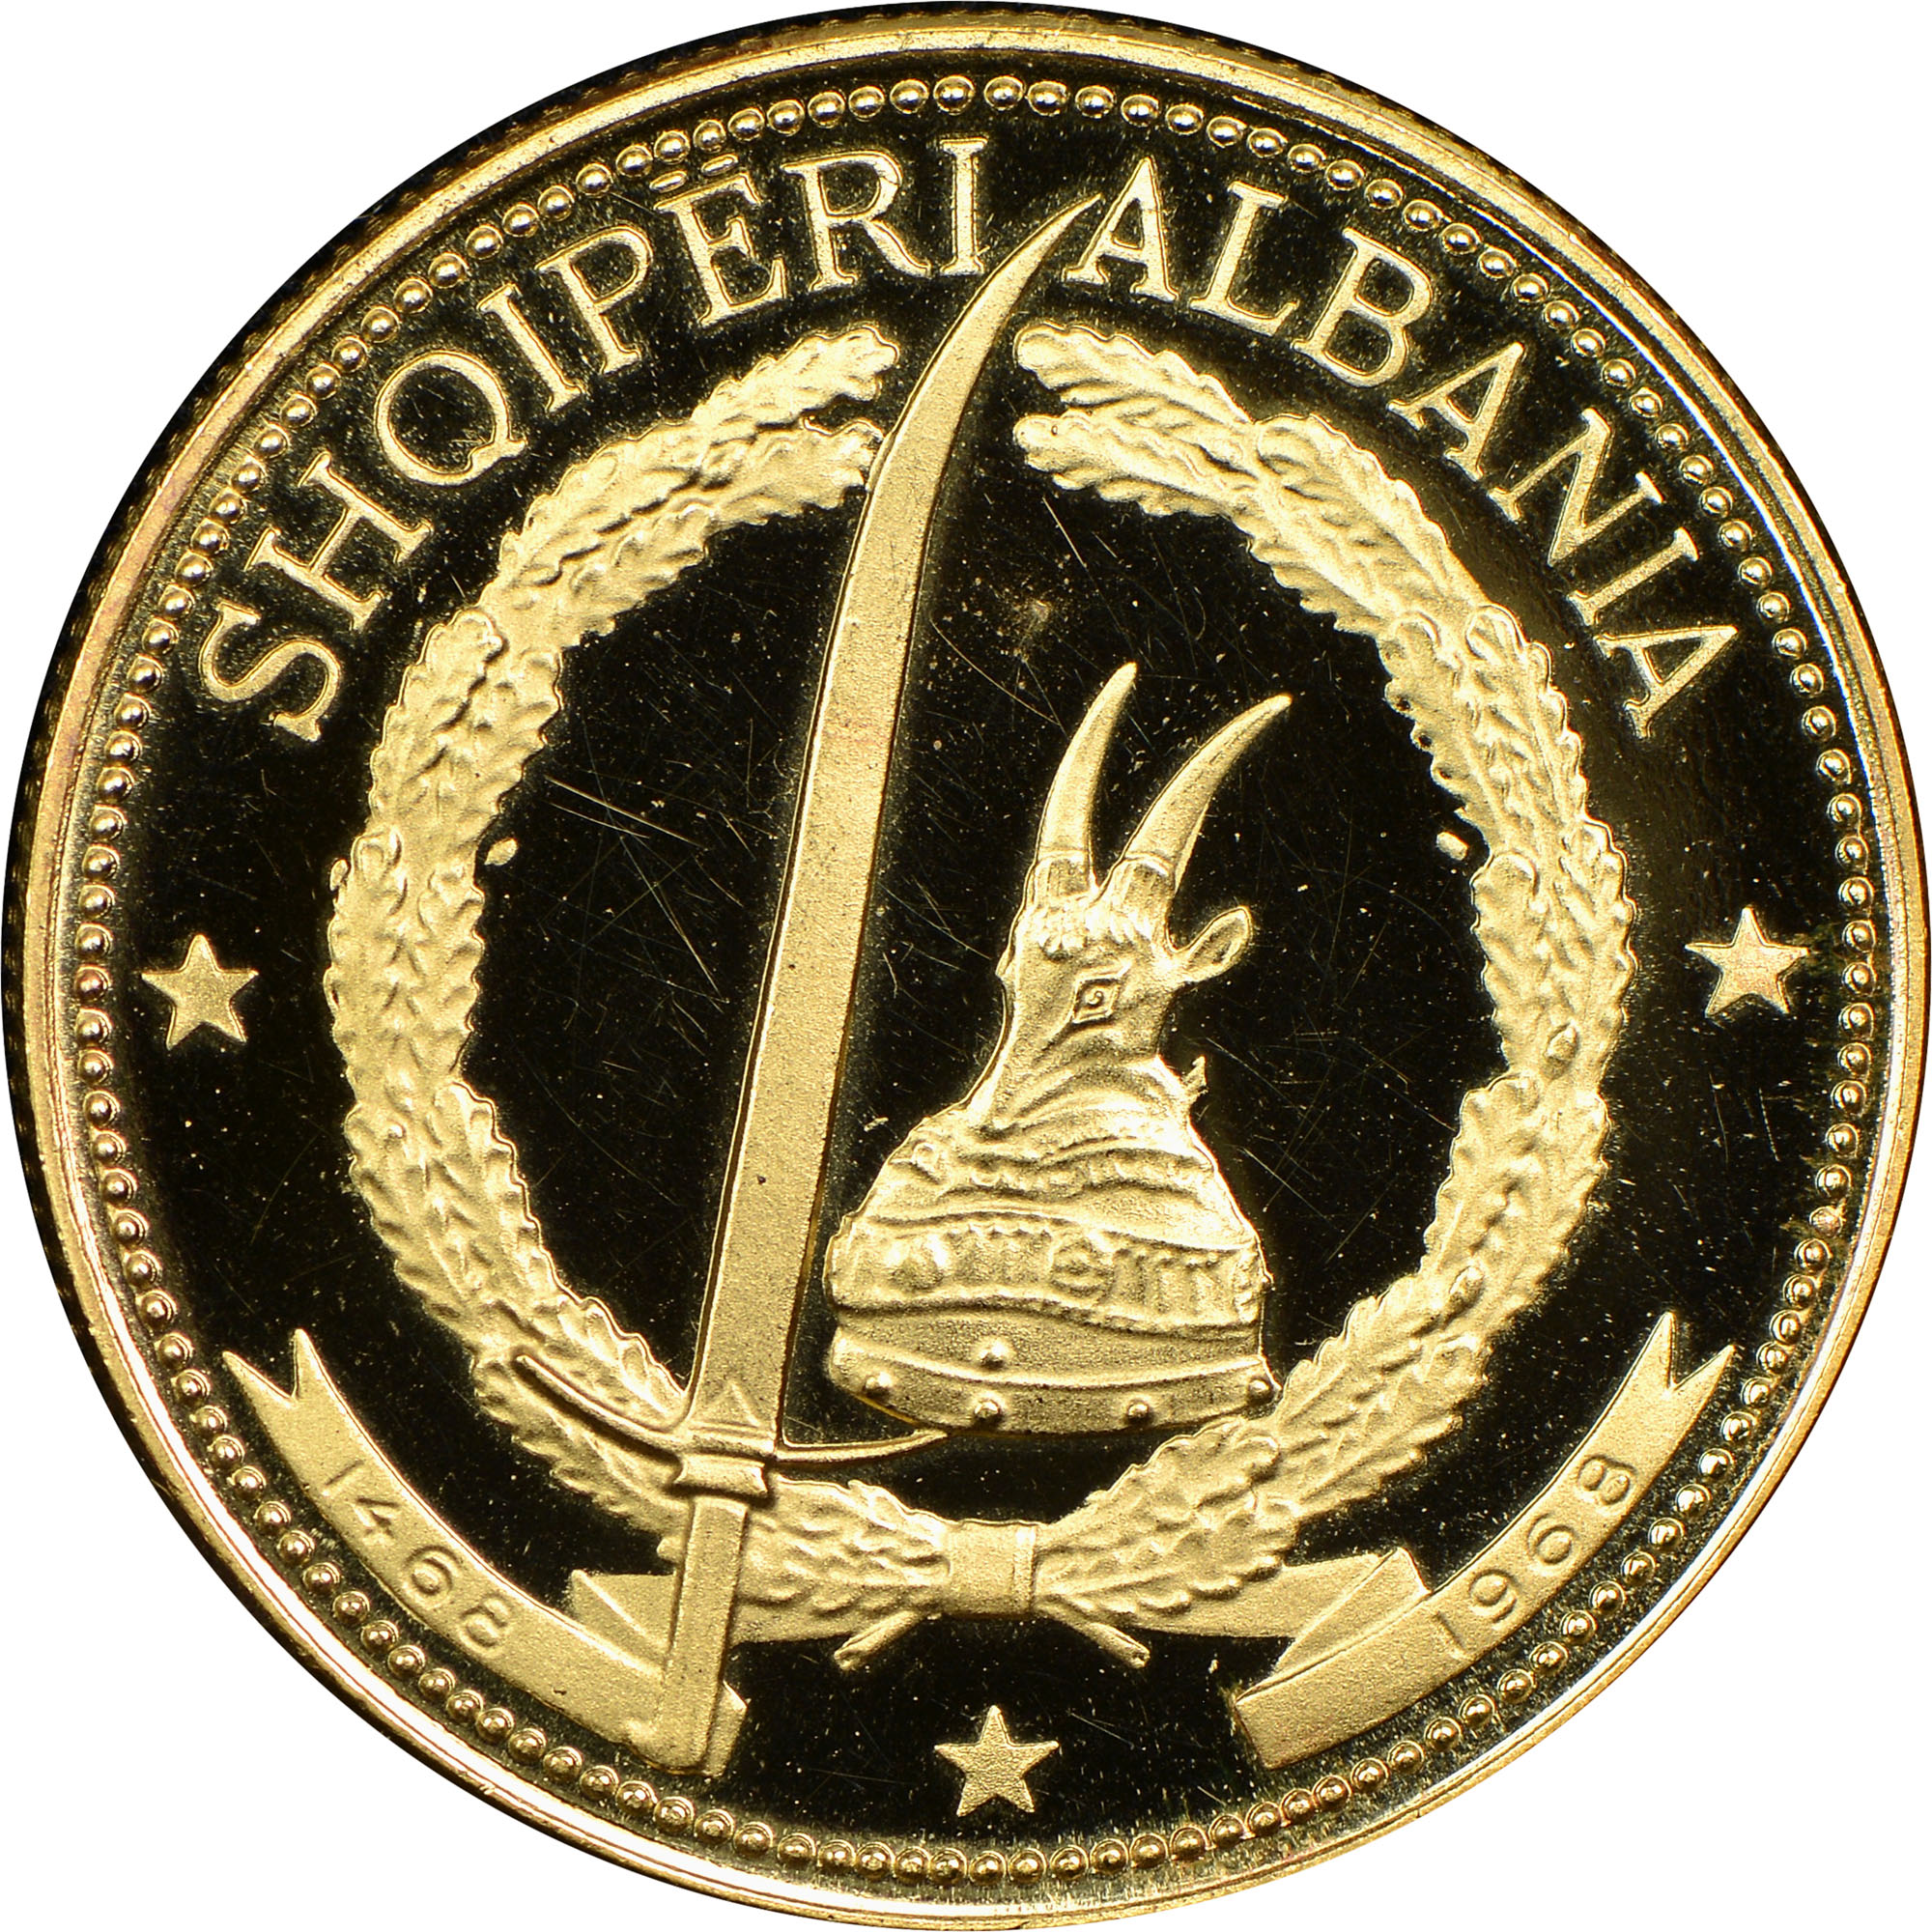 1968 Albania 20 Leke obverse